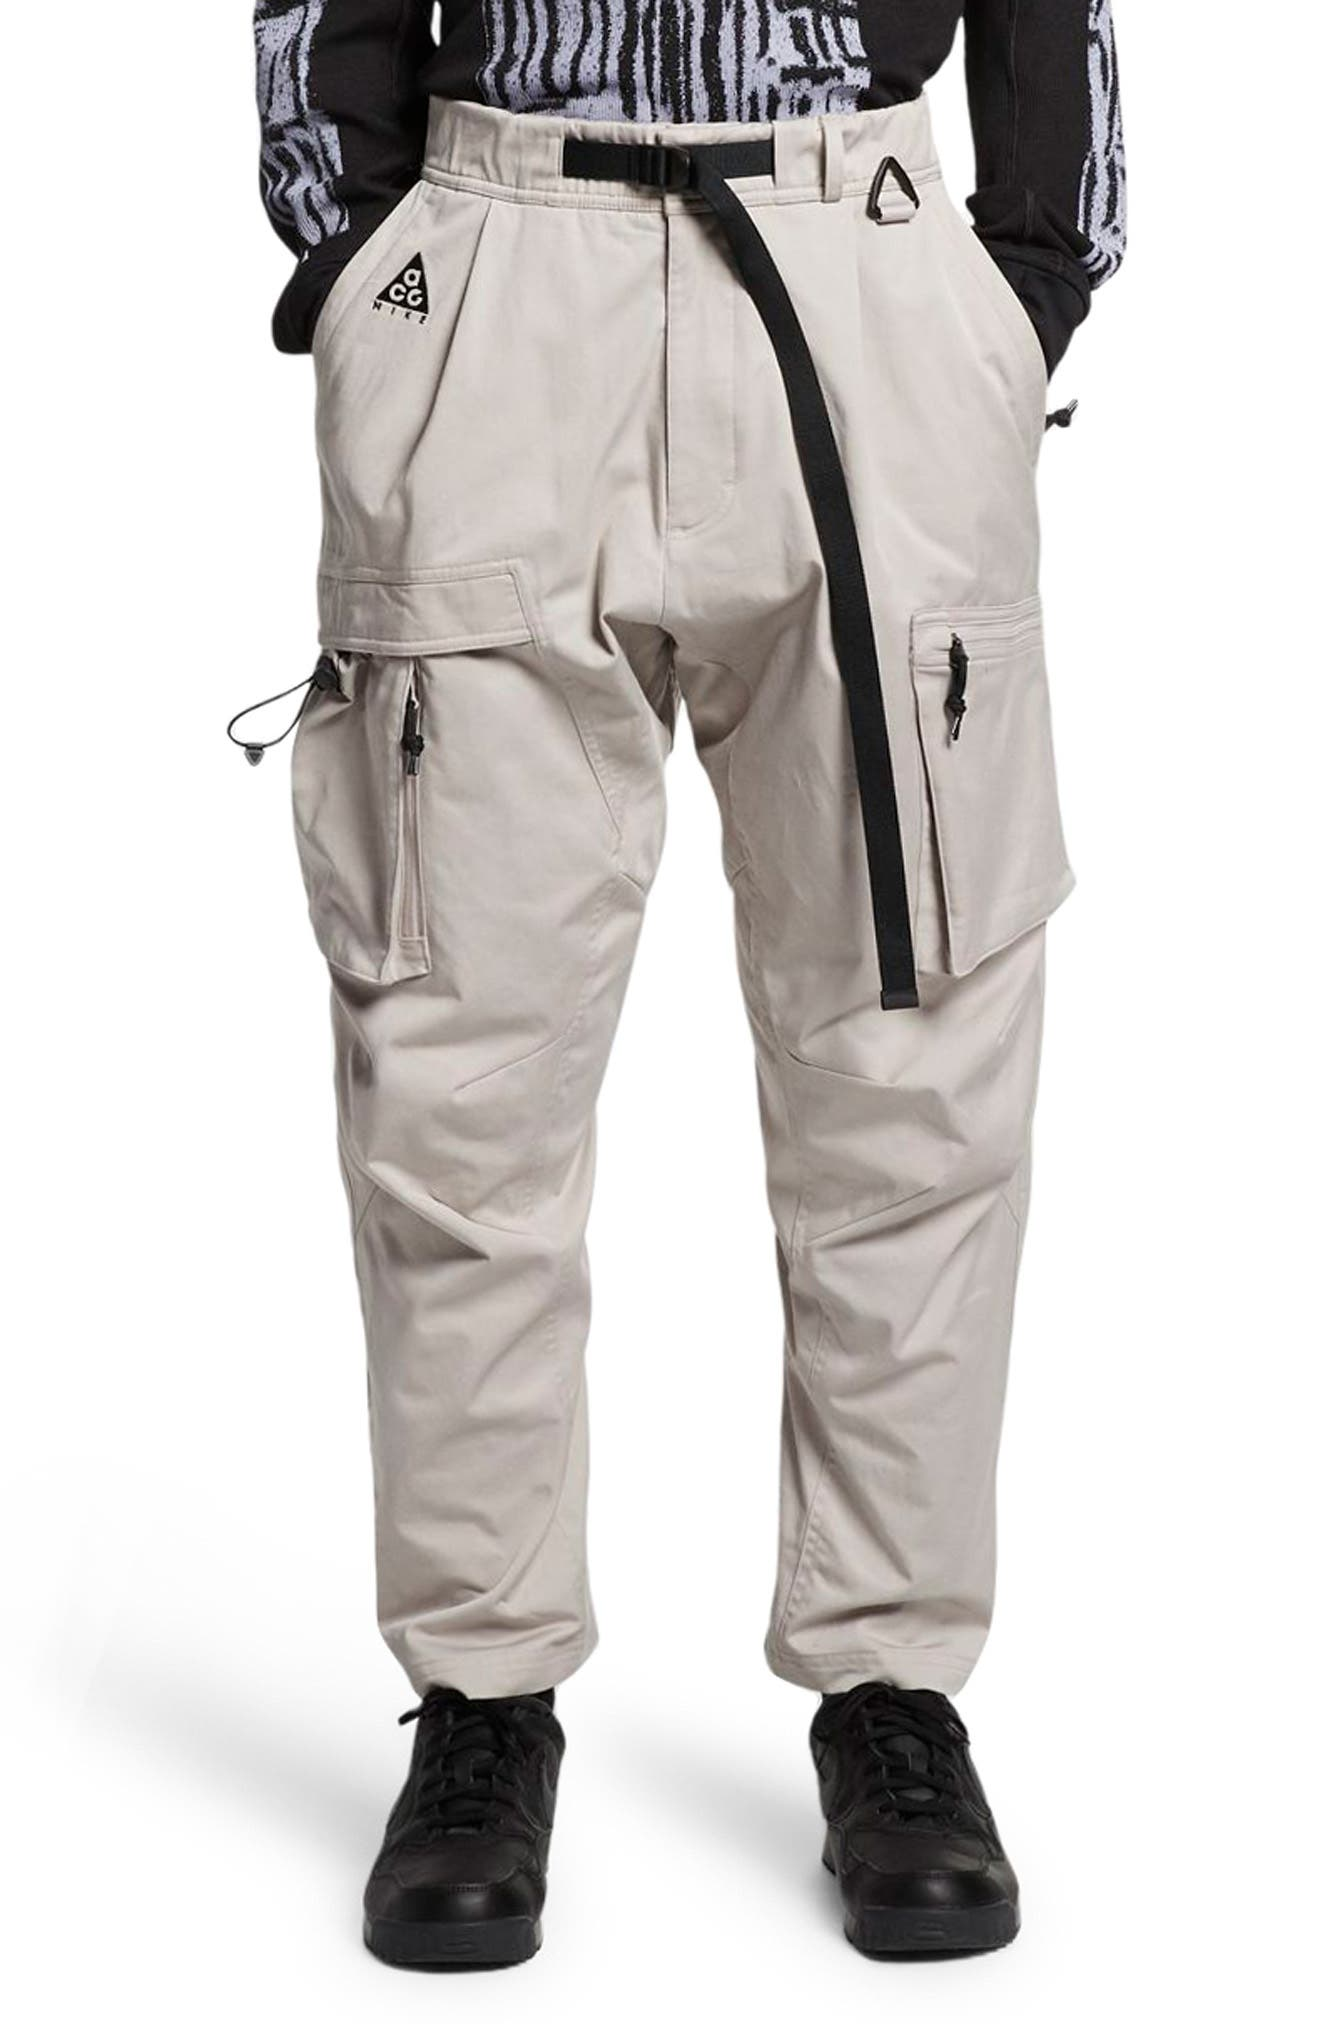 Nike Acg Cargo Pants, Beige